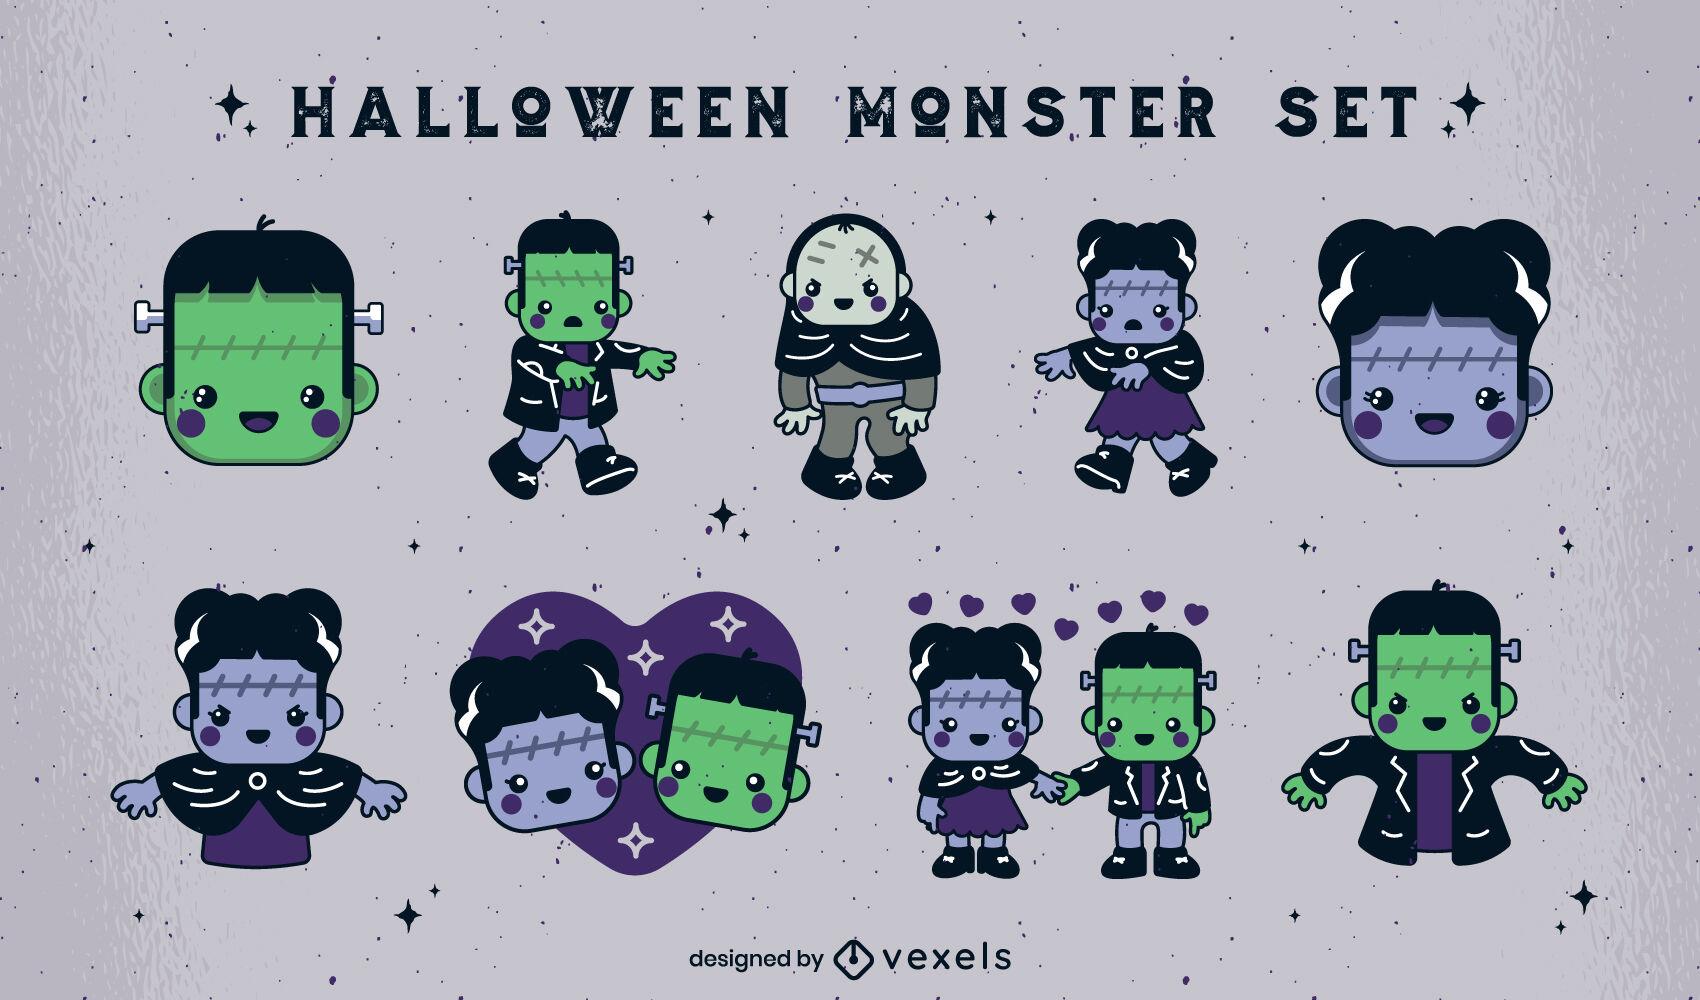 Conjunto de personagens de monstros fofos de Halloween